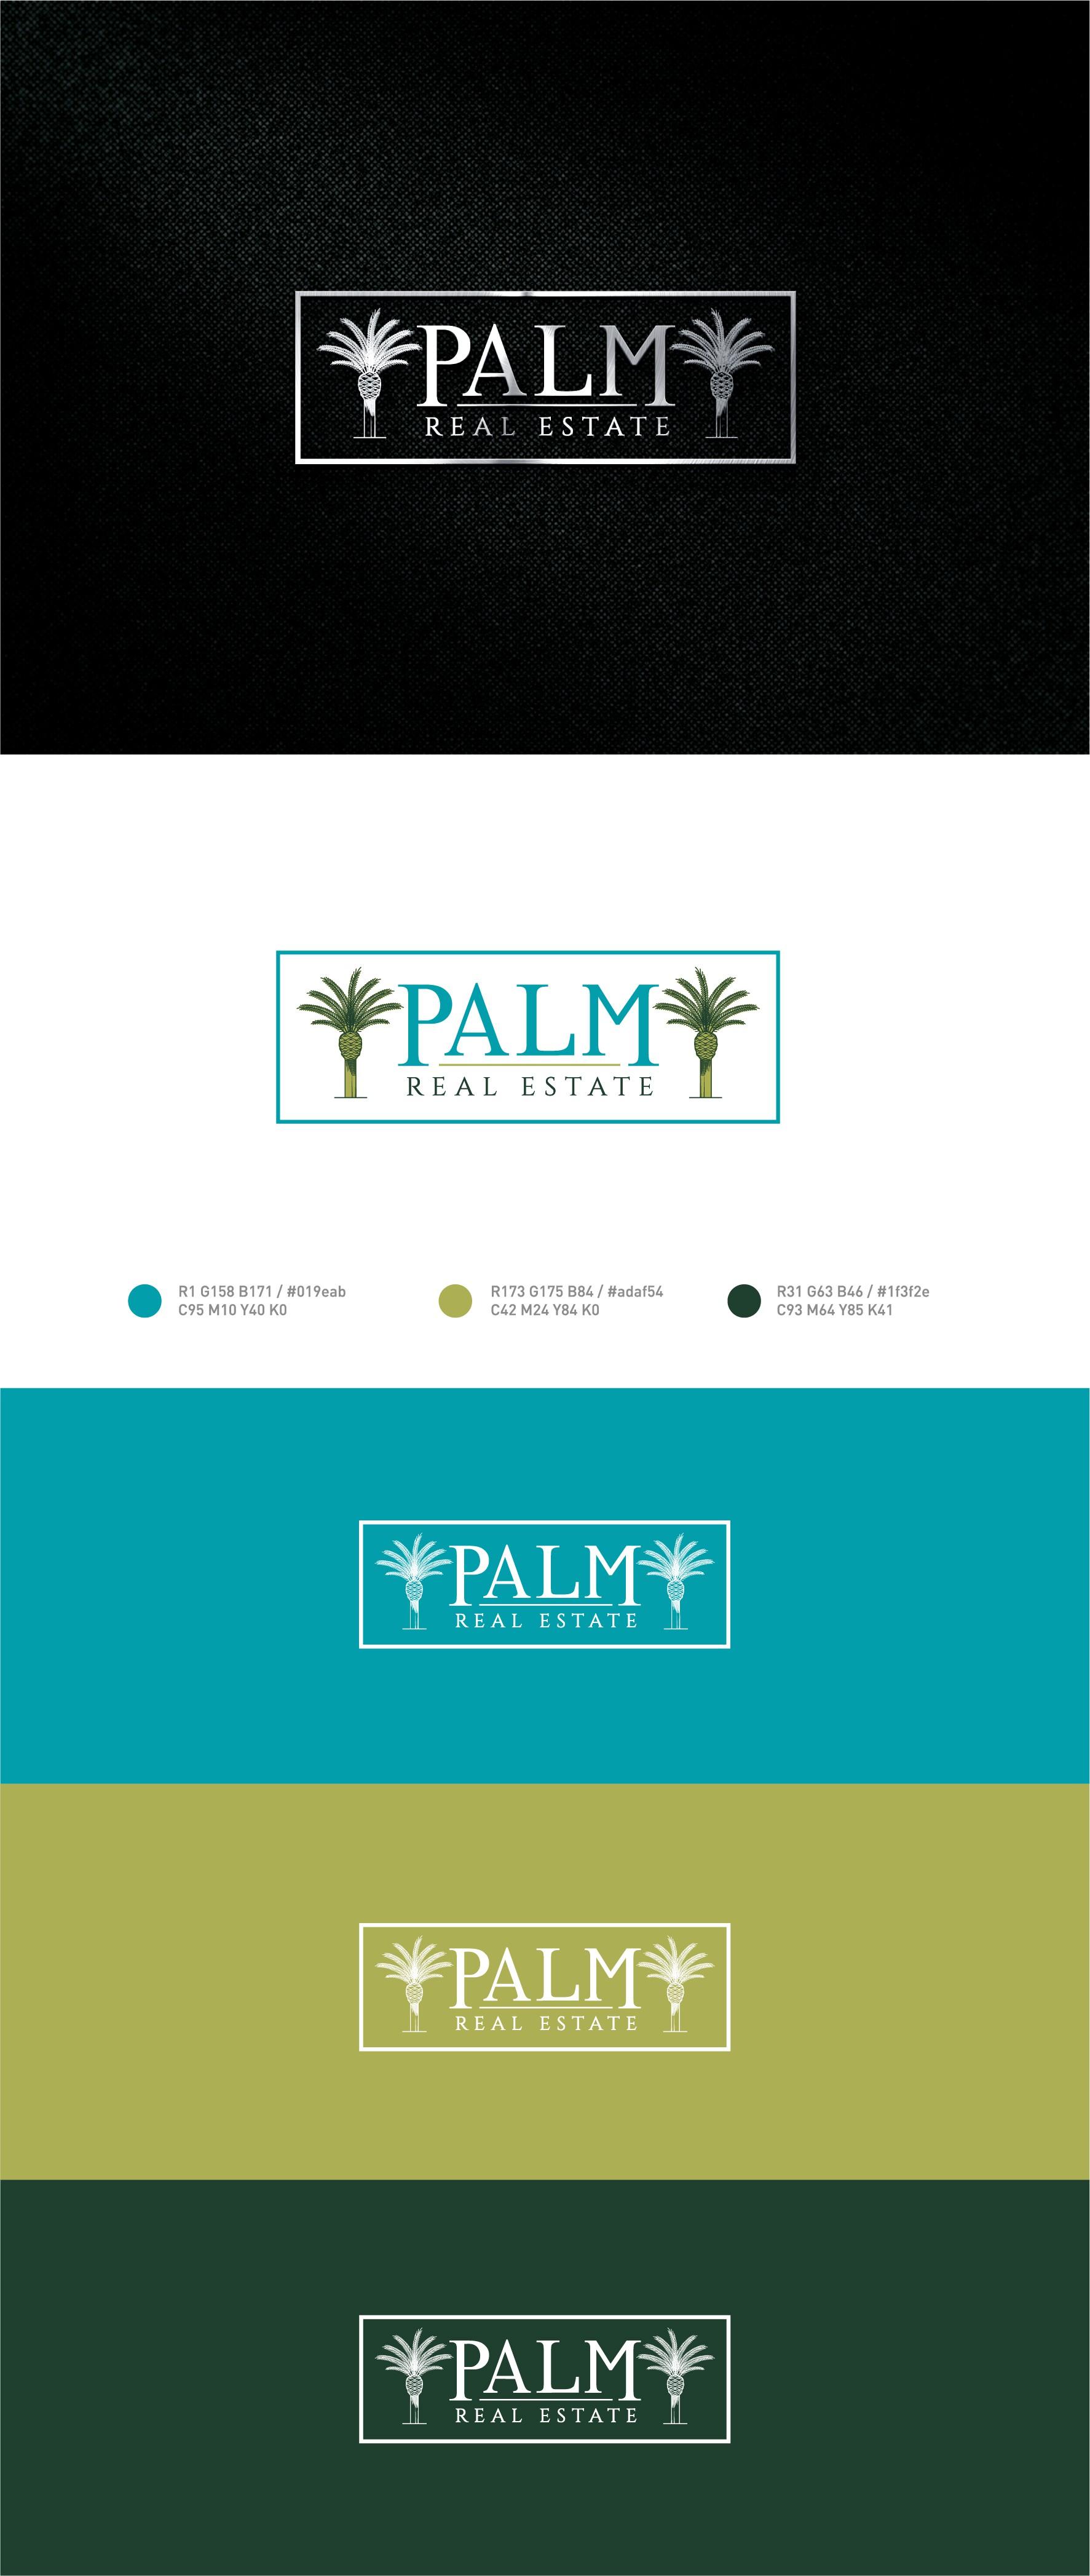 Florida Real Estate Company Needs a New Tropical Logo